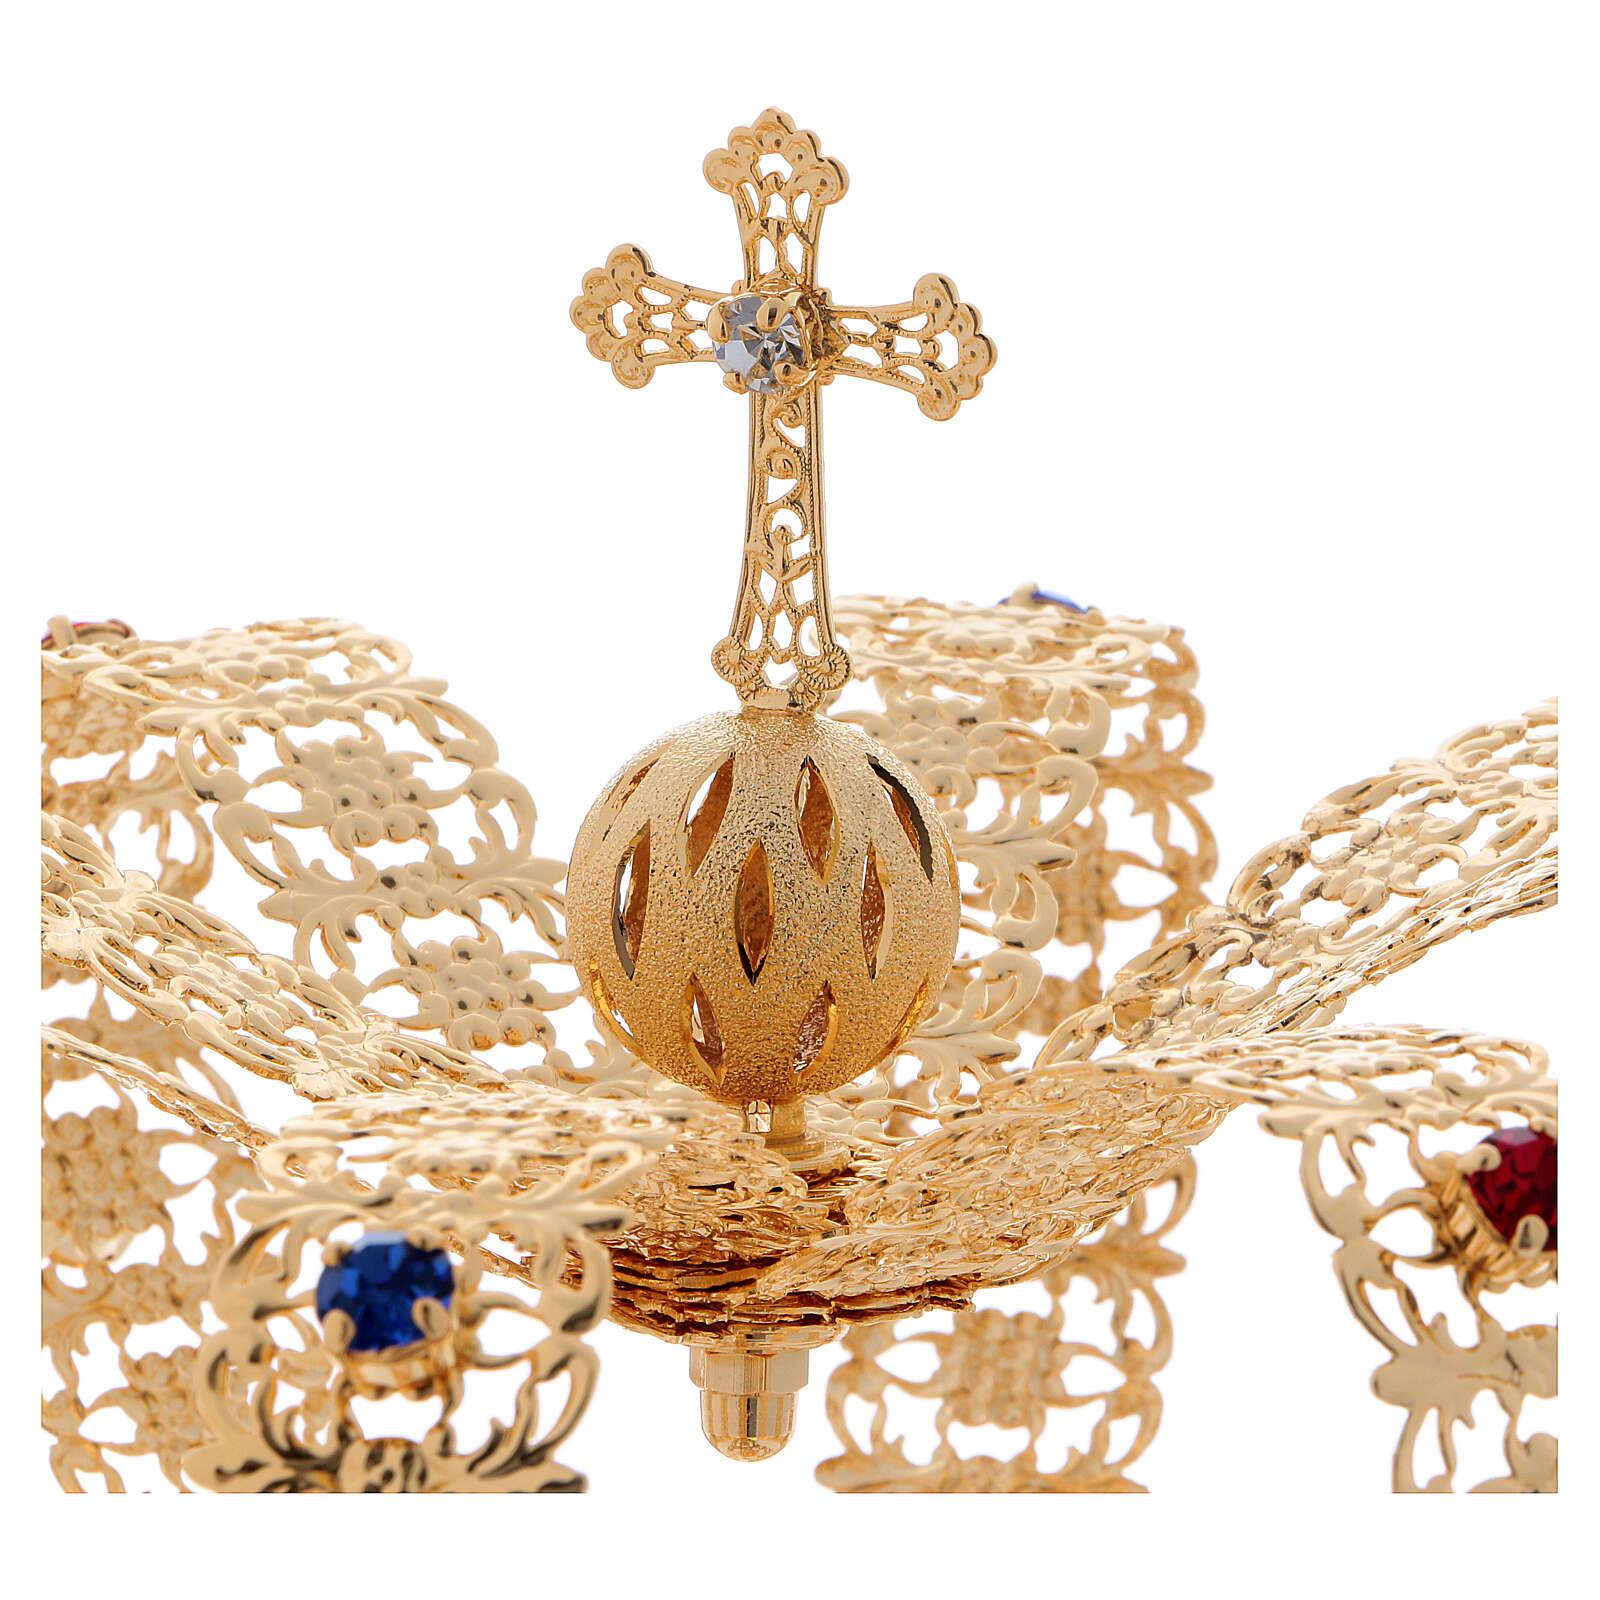 Imperial crown cross and stones 4 3/4 in diameter 3